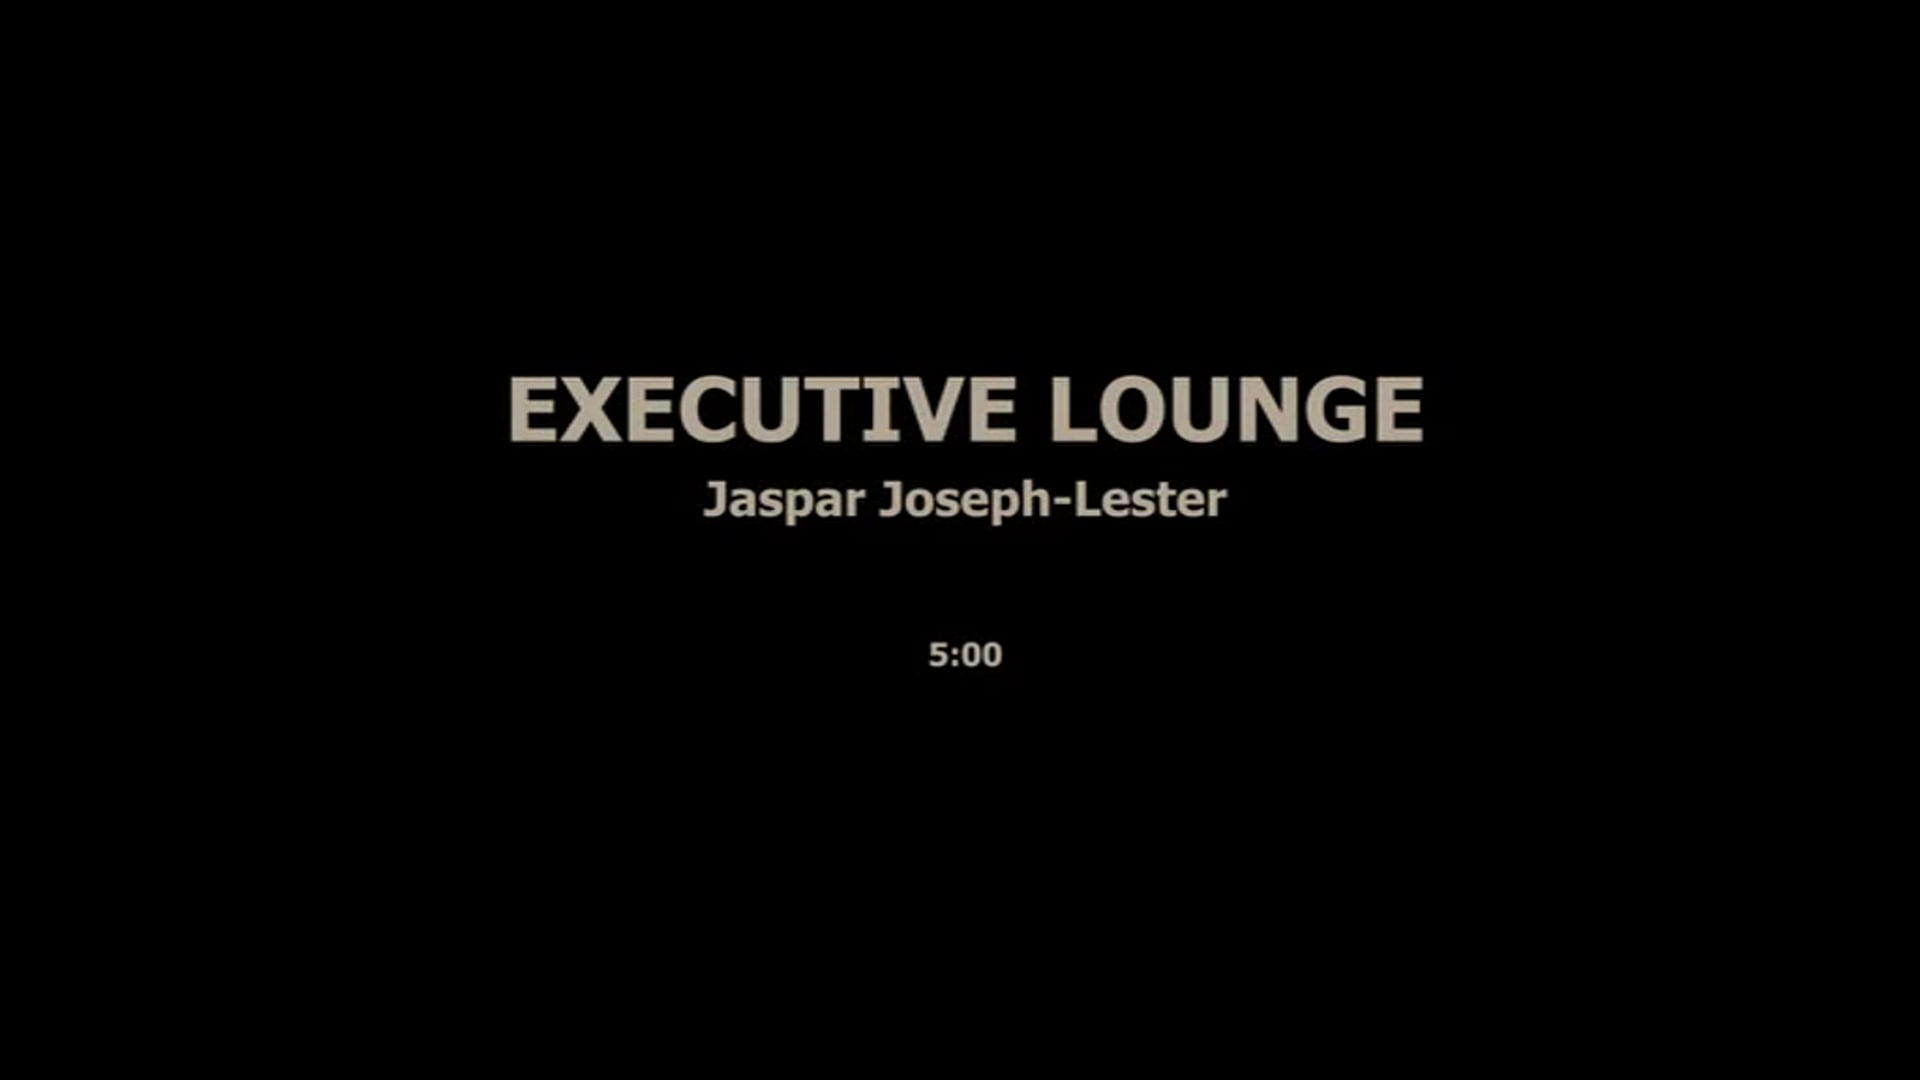 EXECUTIVE LOUNGE - JASPAR JOSEPH LESTER